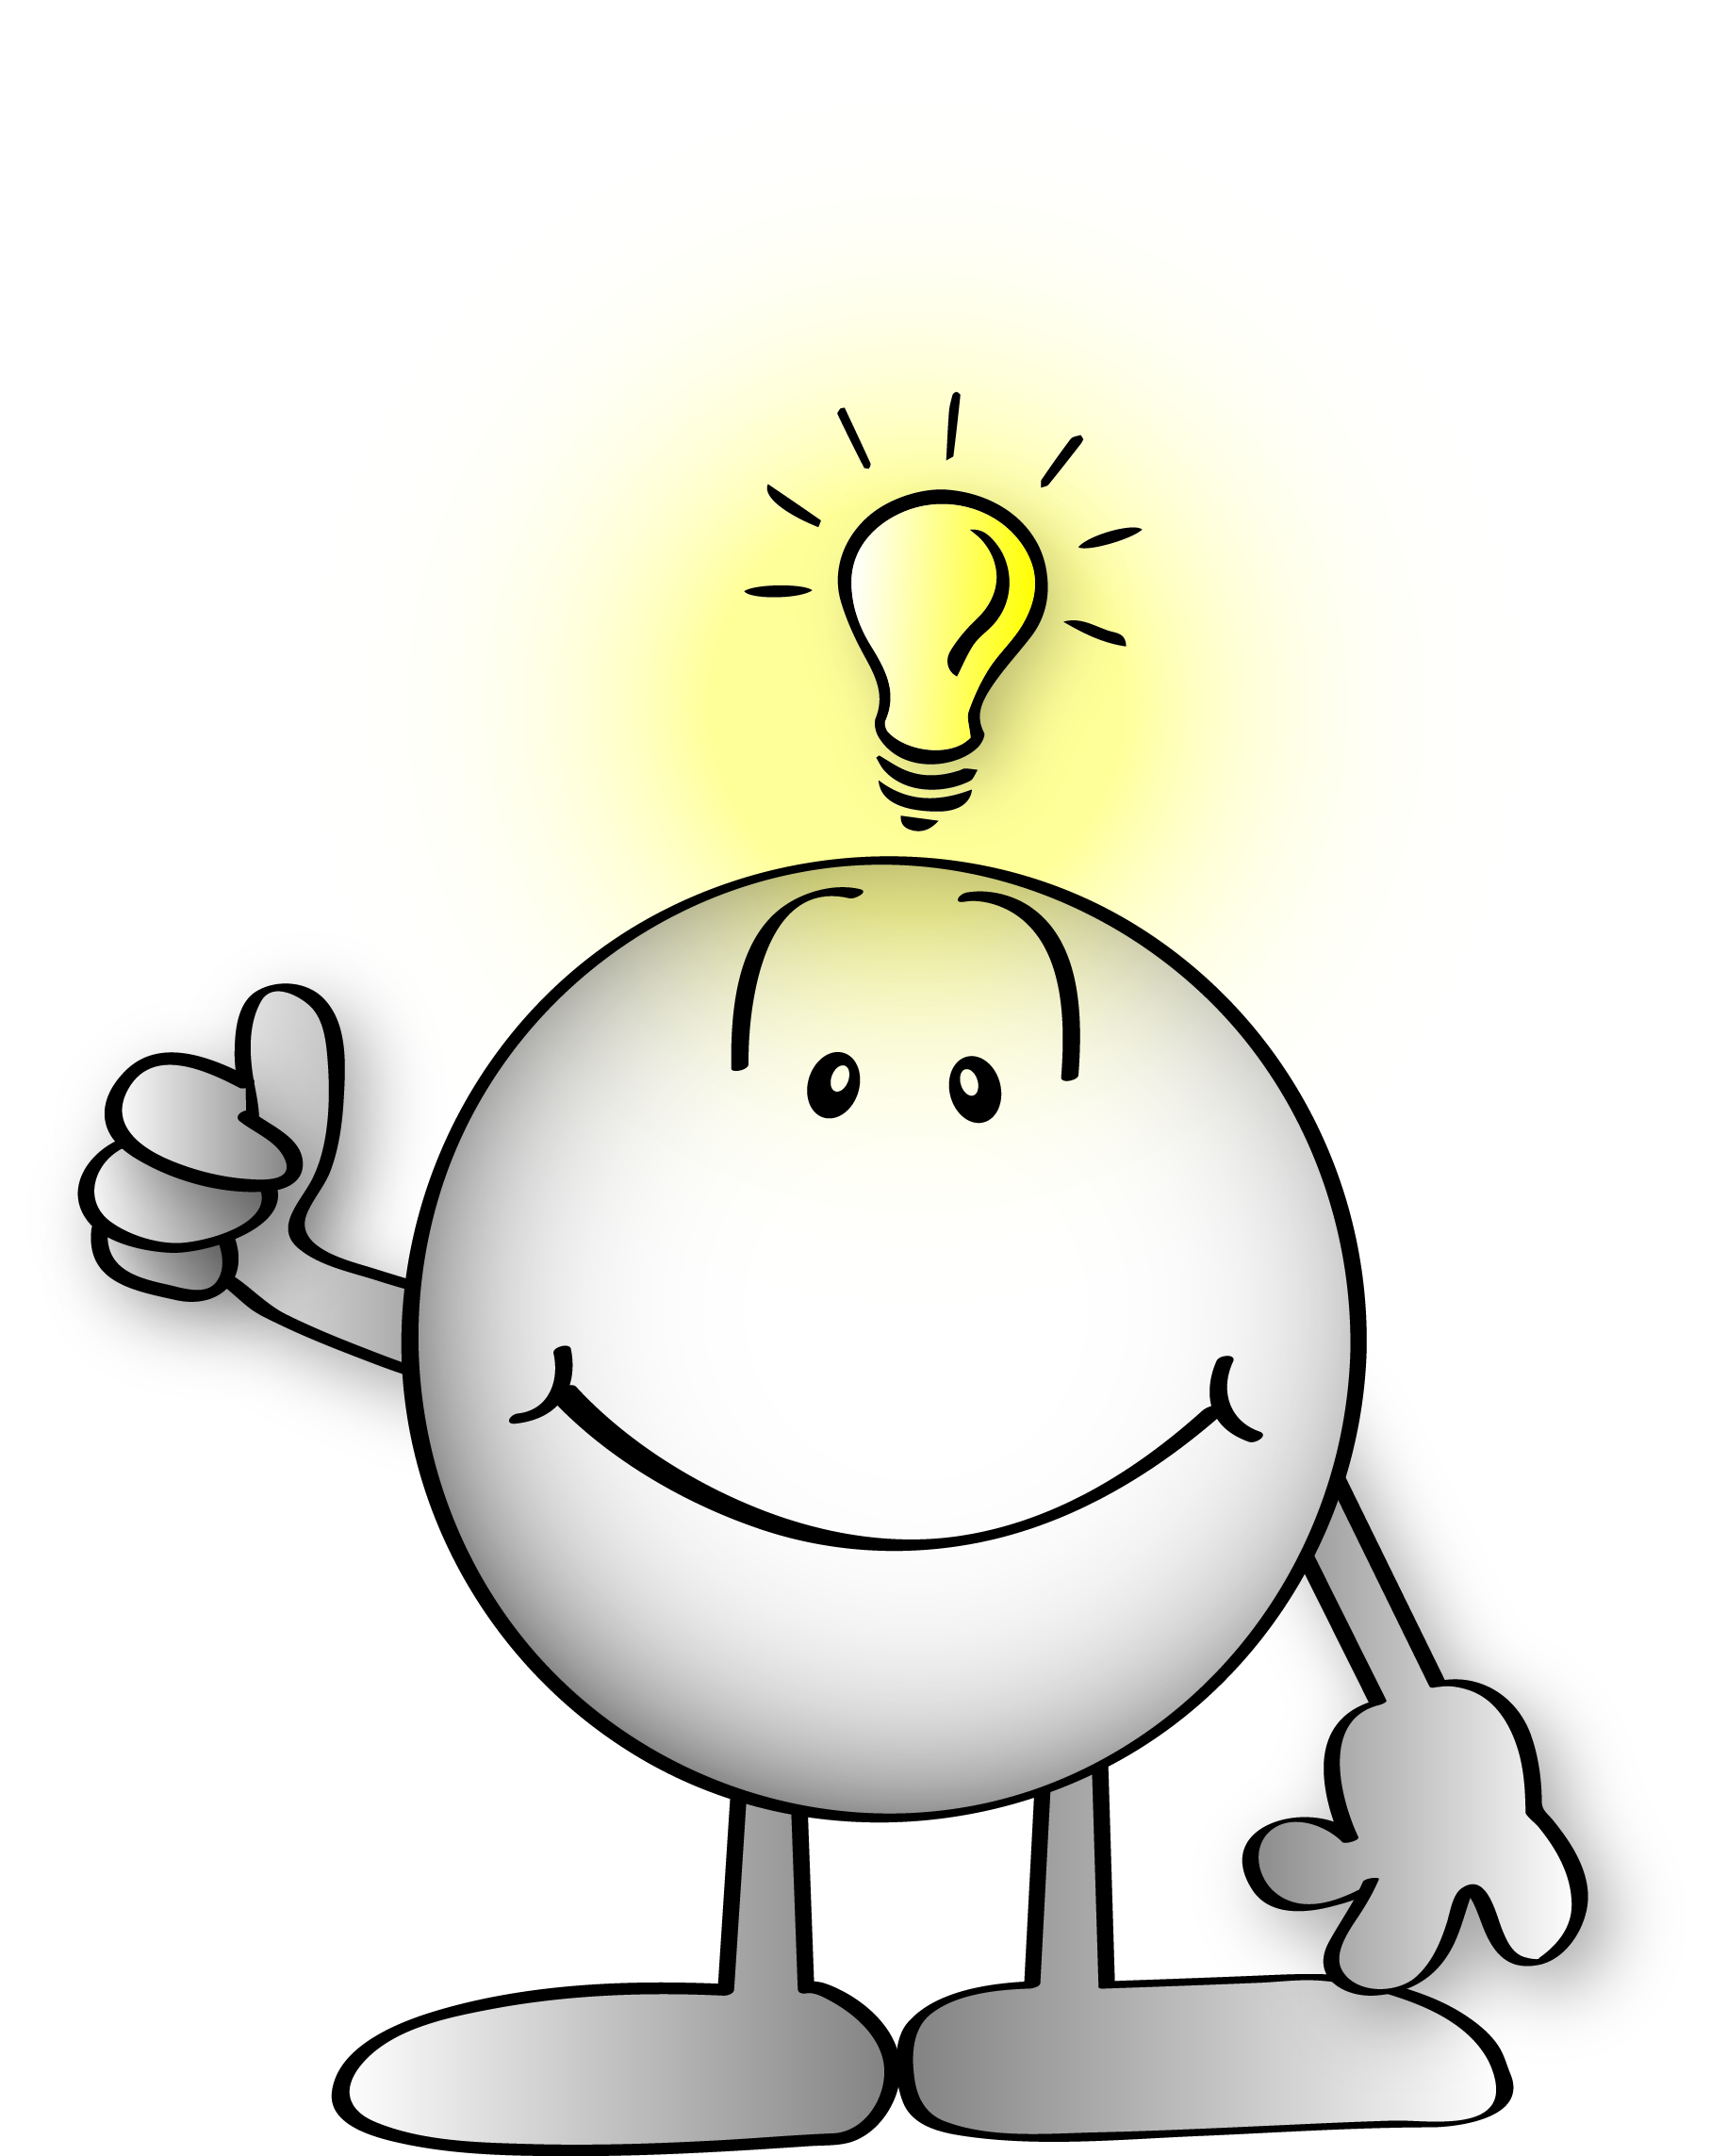 Free bright cliparts download. Idea clipart understanding person